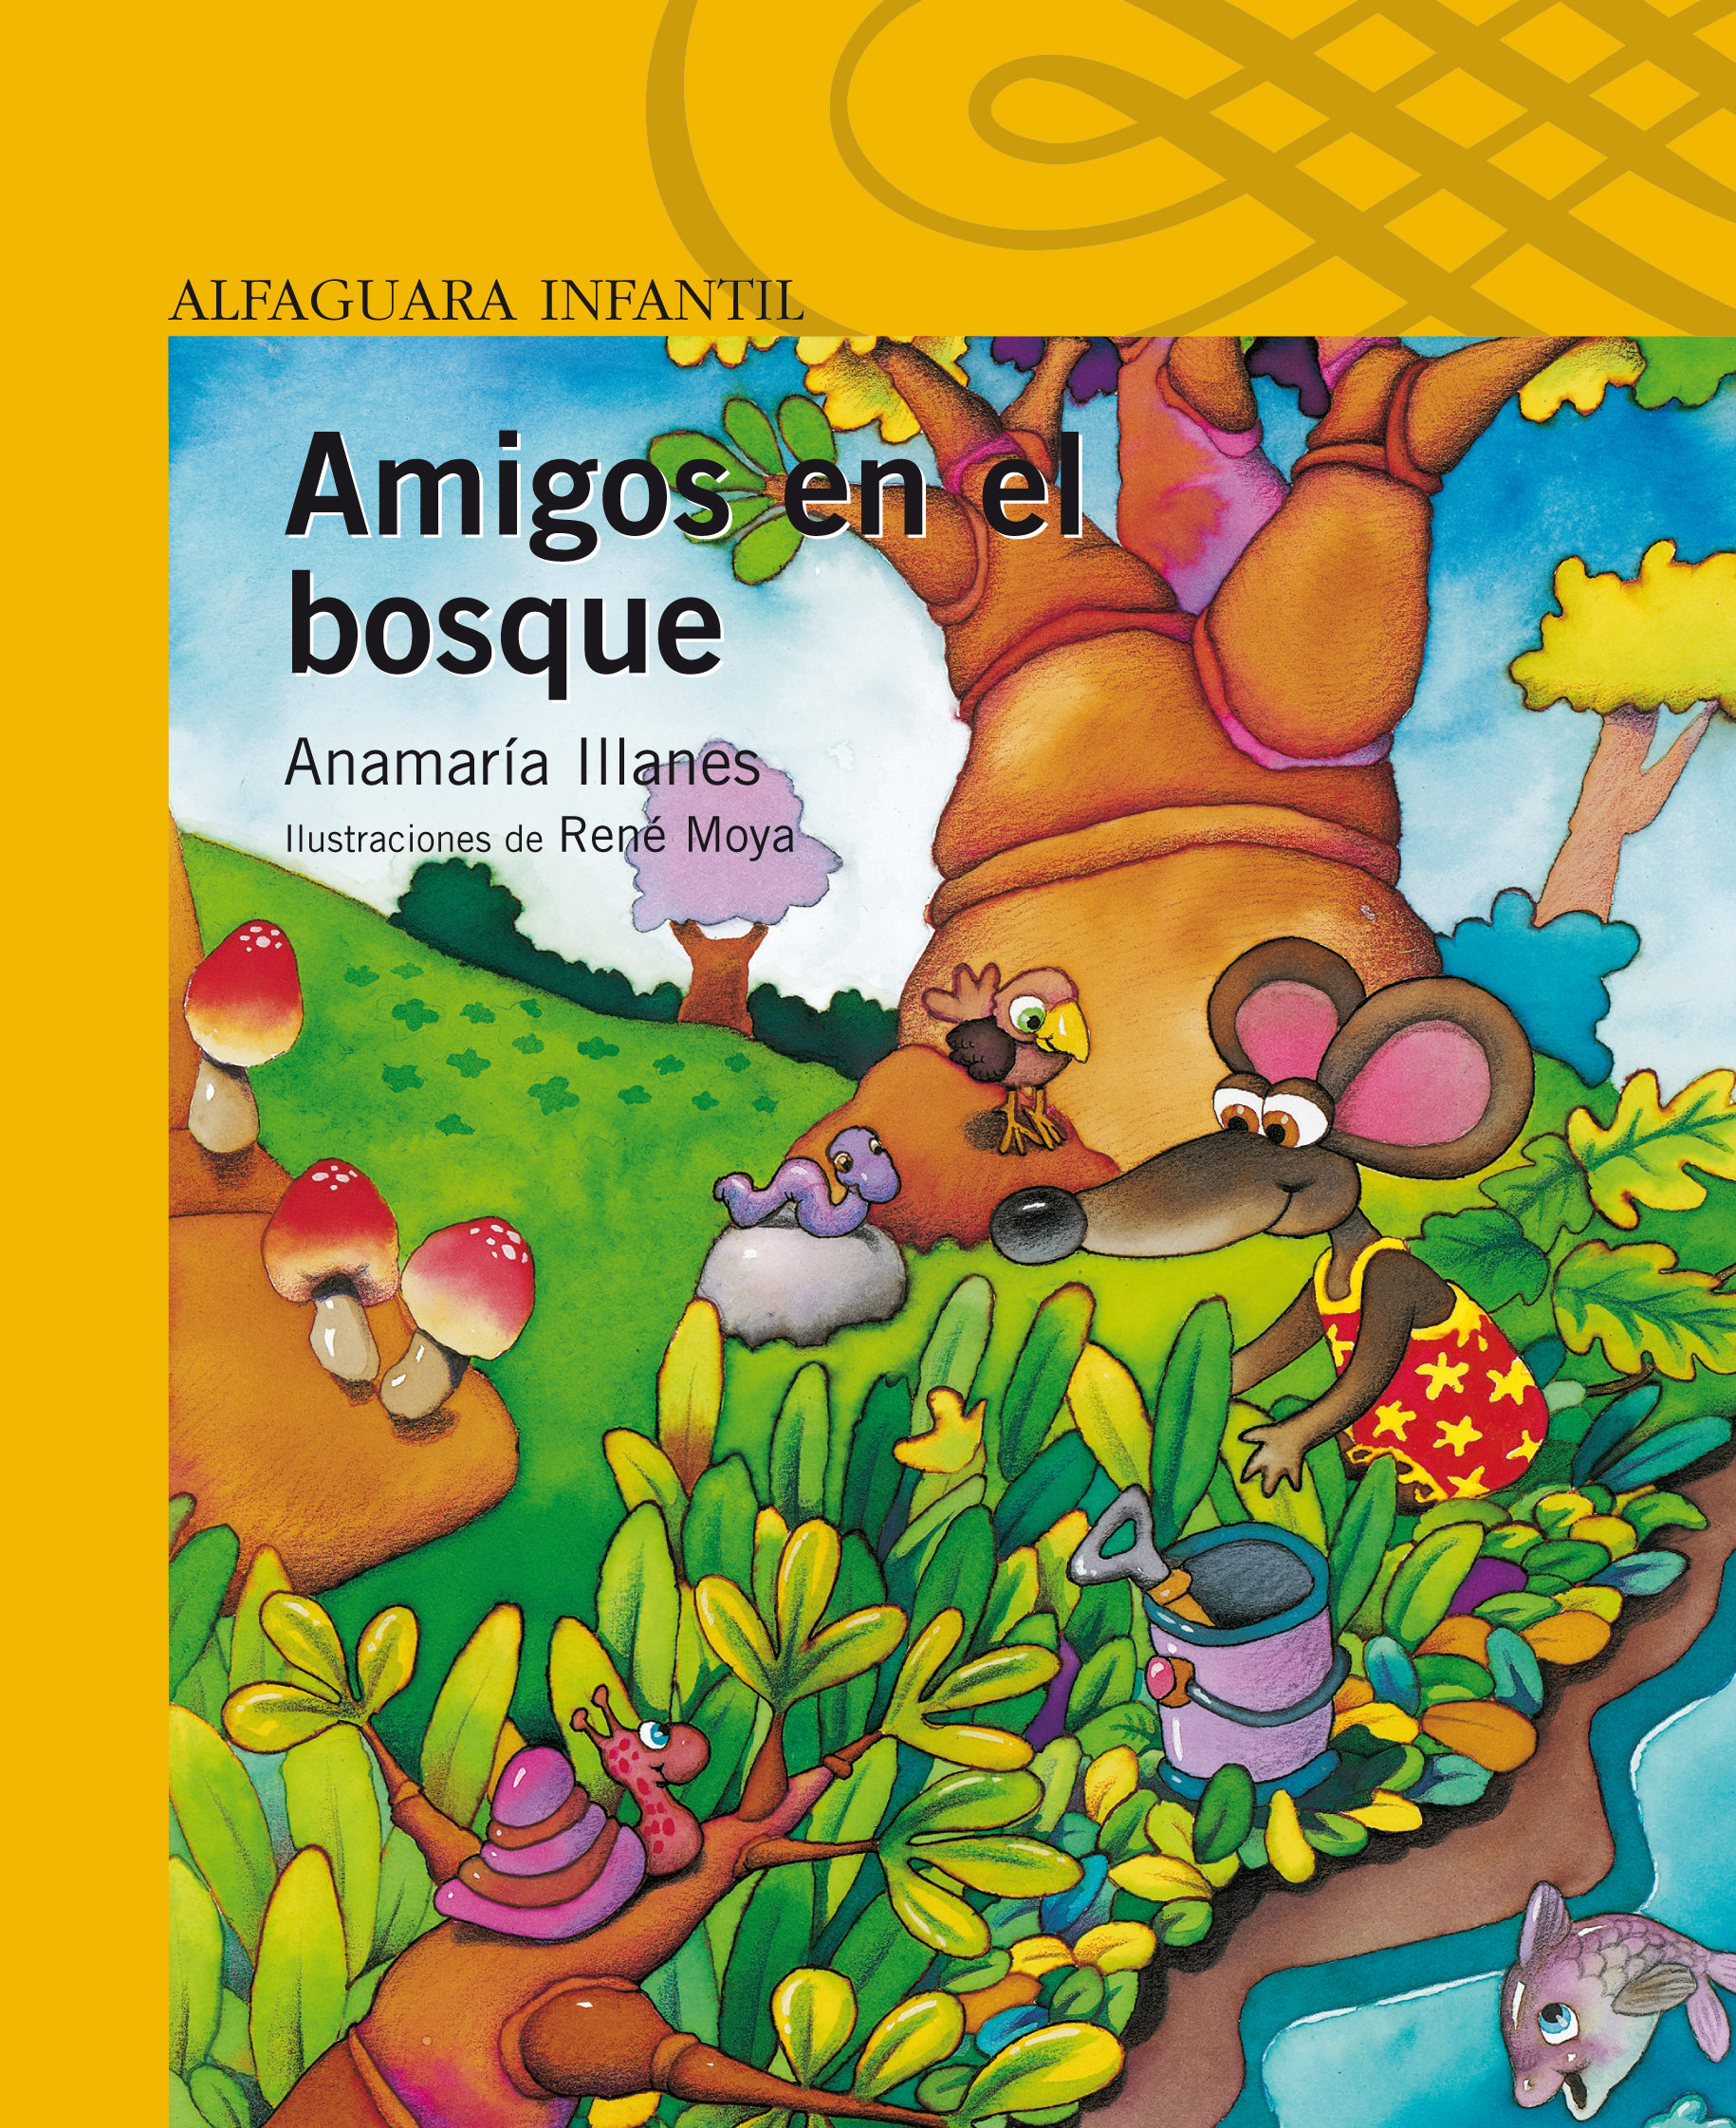 libros alfaguara infantil para descargar gratis